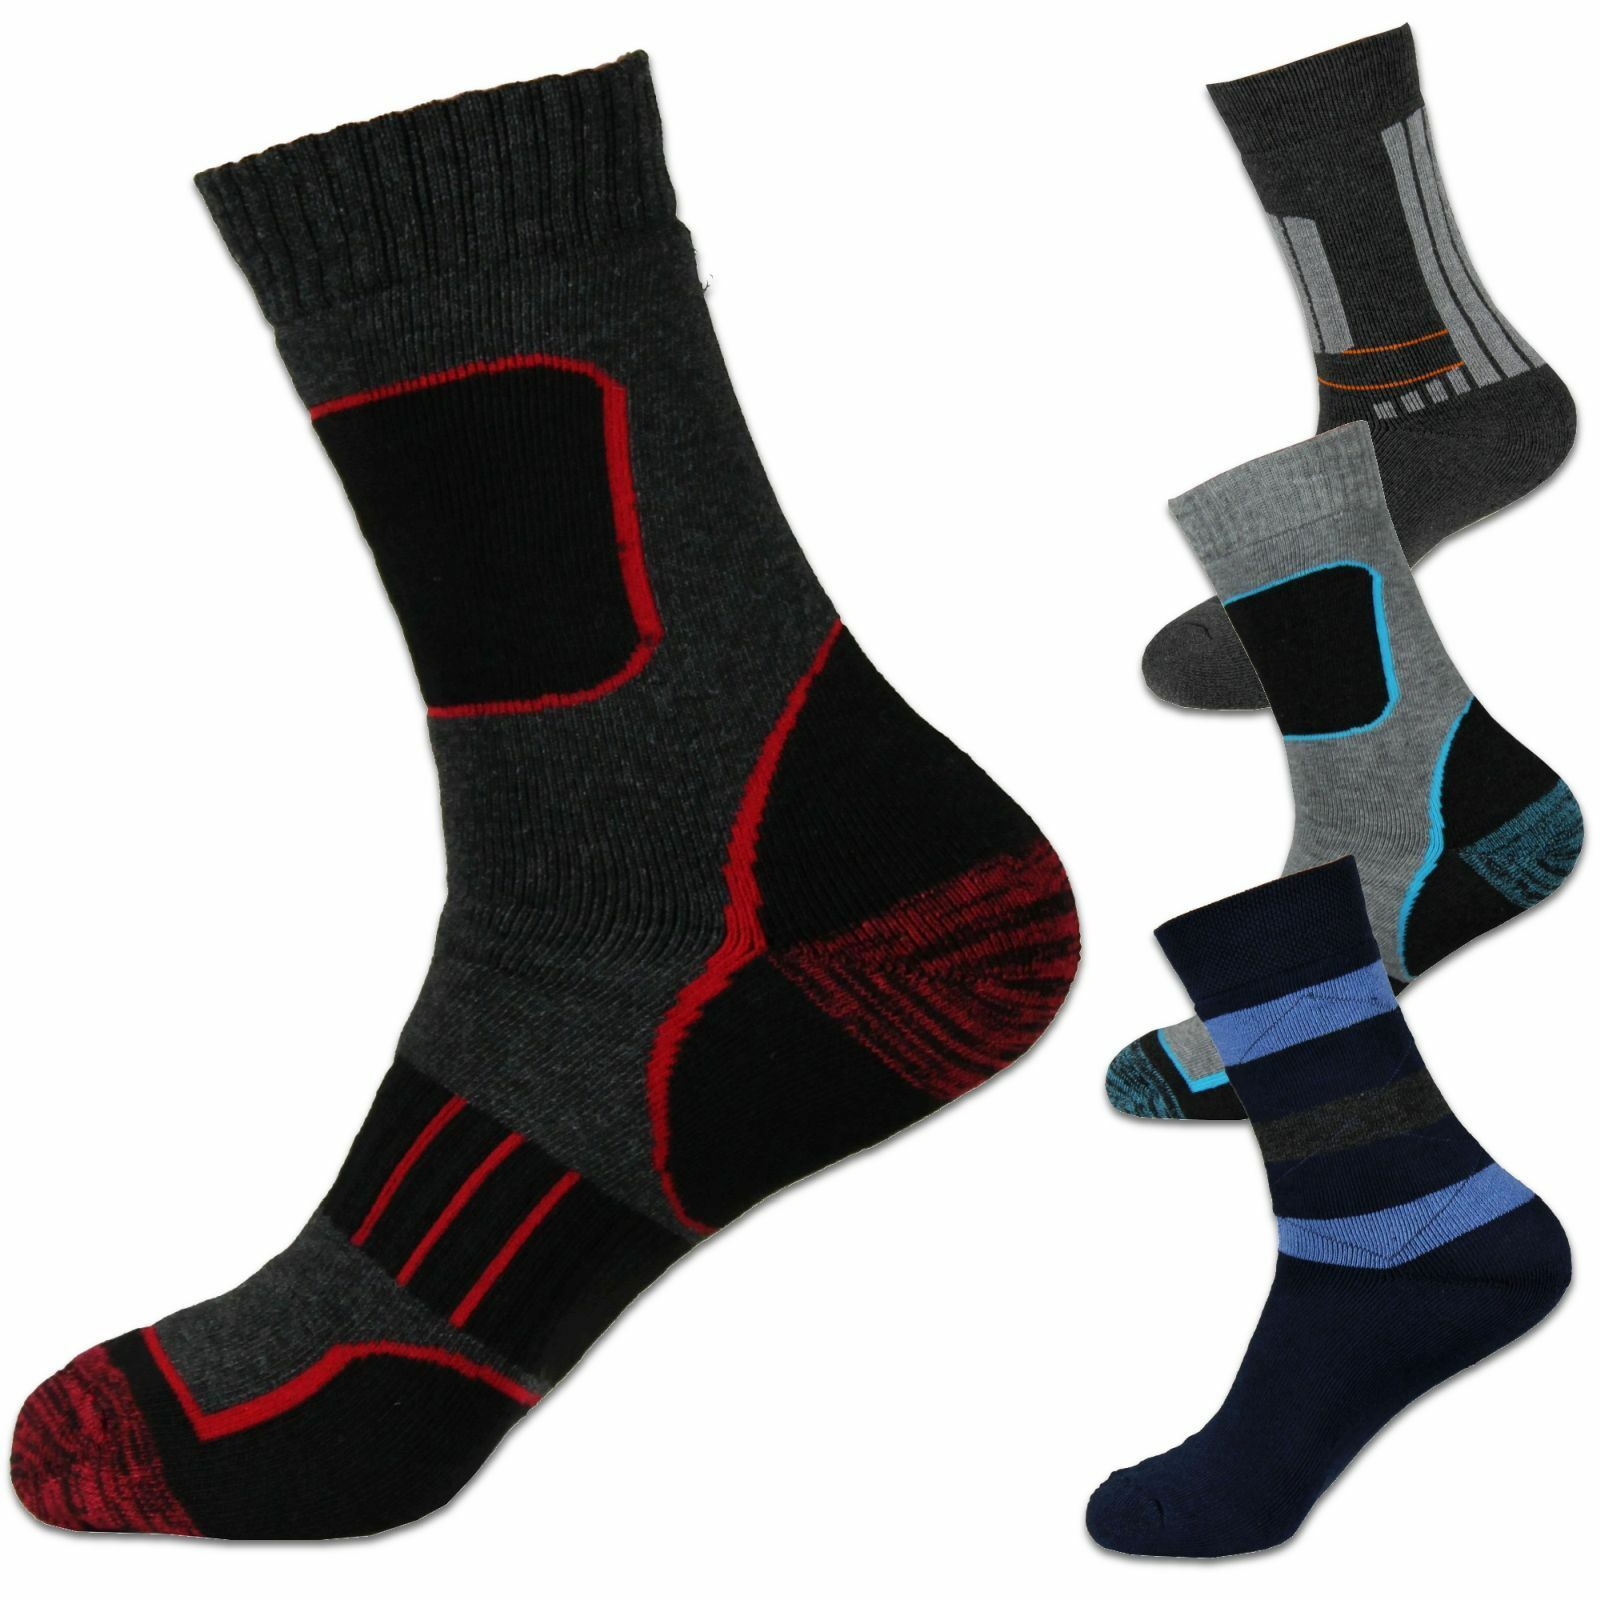 ►24 Paar Thermo Socken Strümpfe Warme Dicke Winter Sport Arbeitssocken Herren